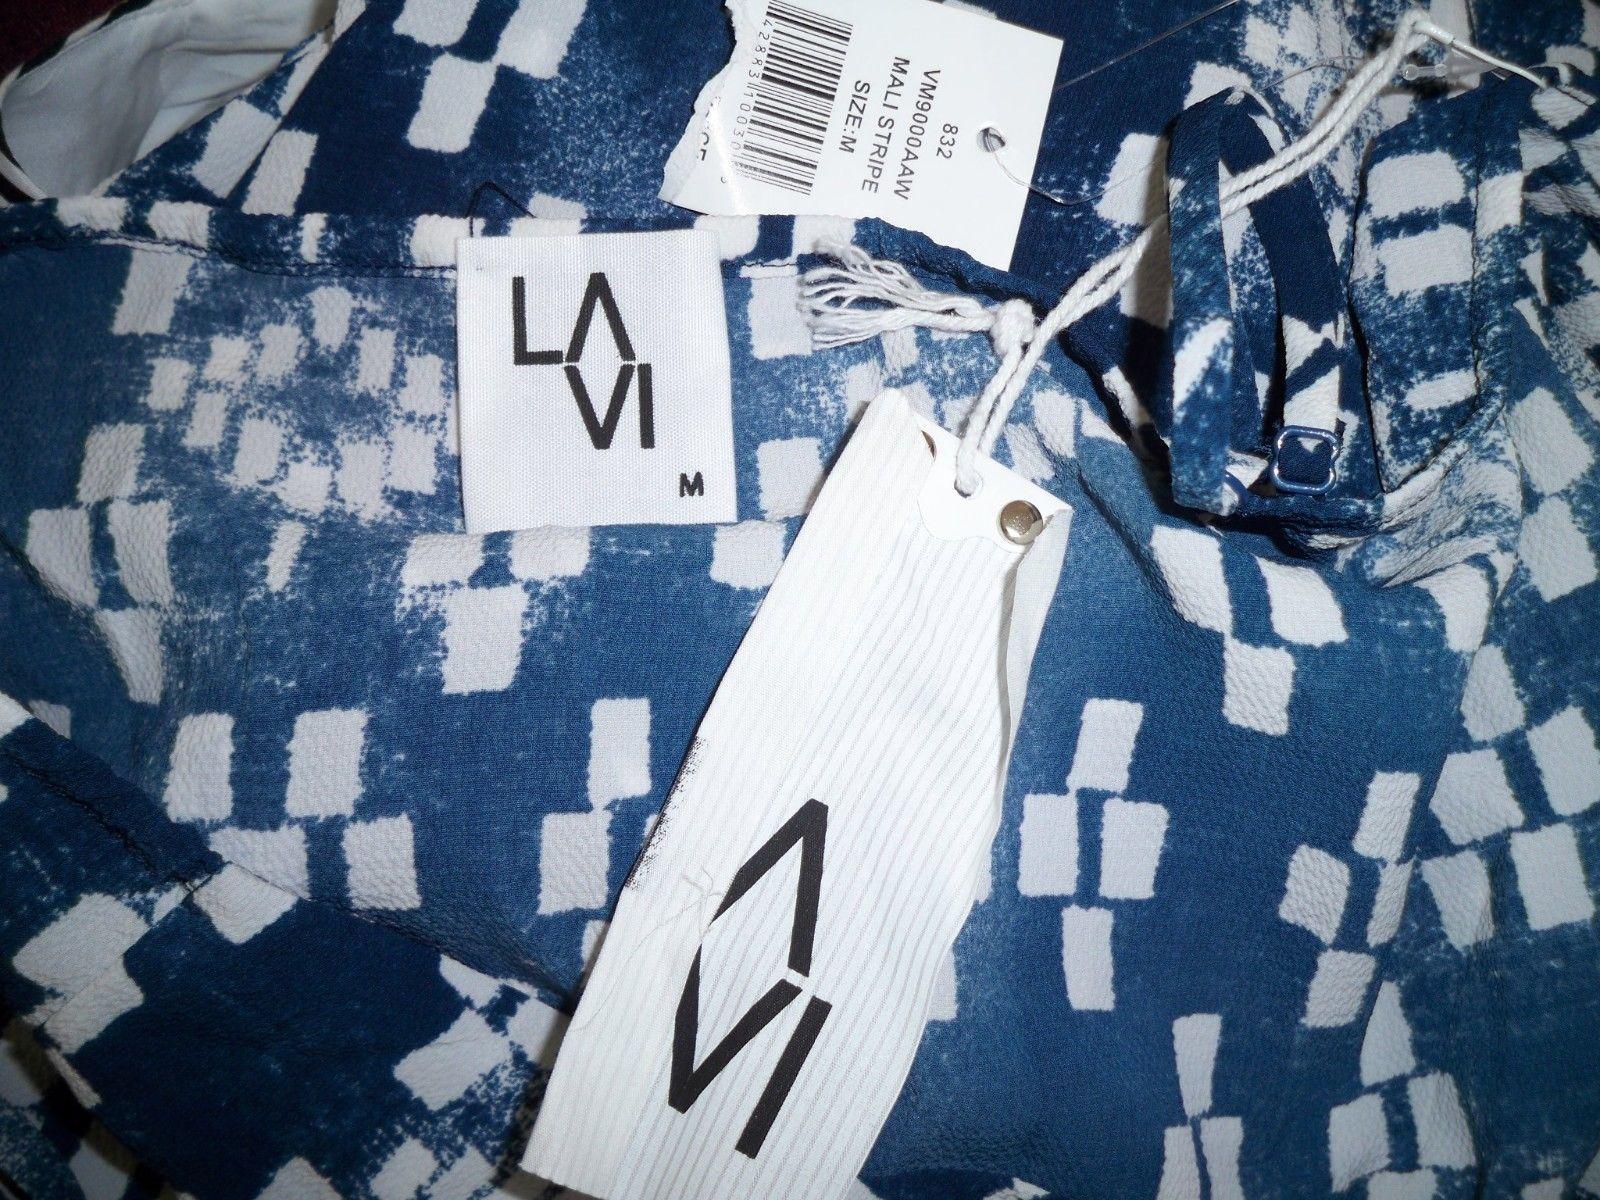 NWT LAVI Sam & Lavi Anthropologie Mali Jumpsuit M Batik Ikat Tie Front Tie Dye